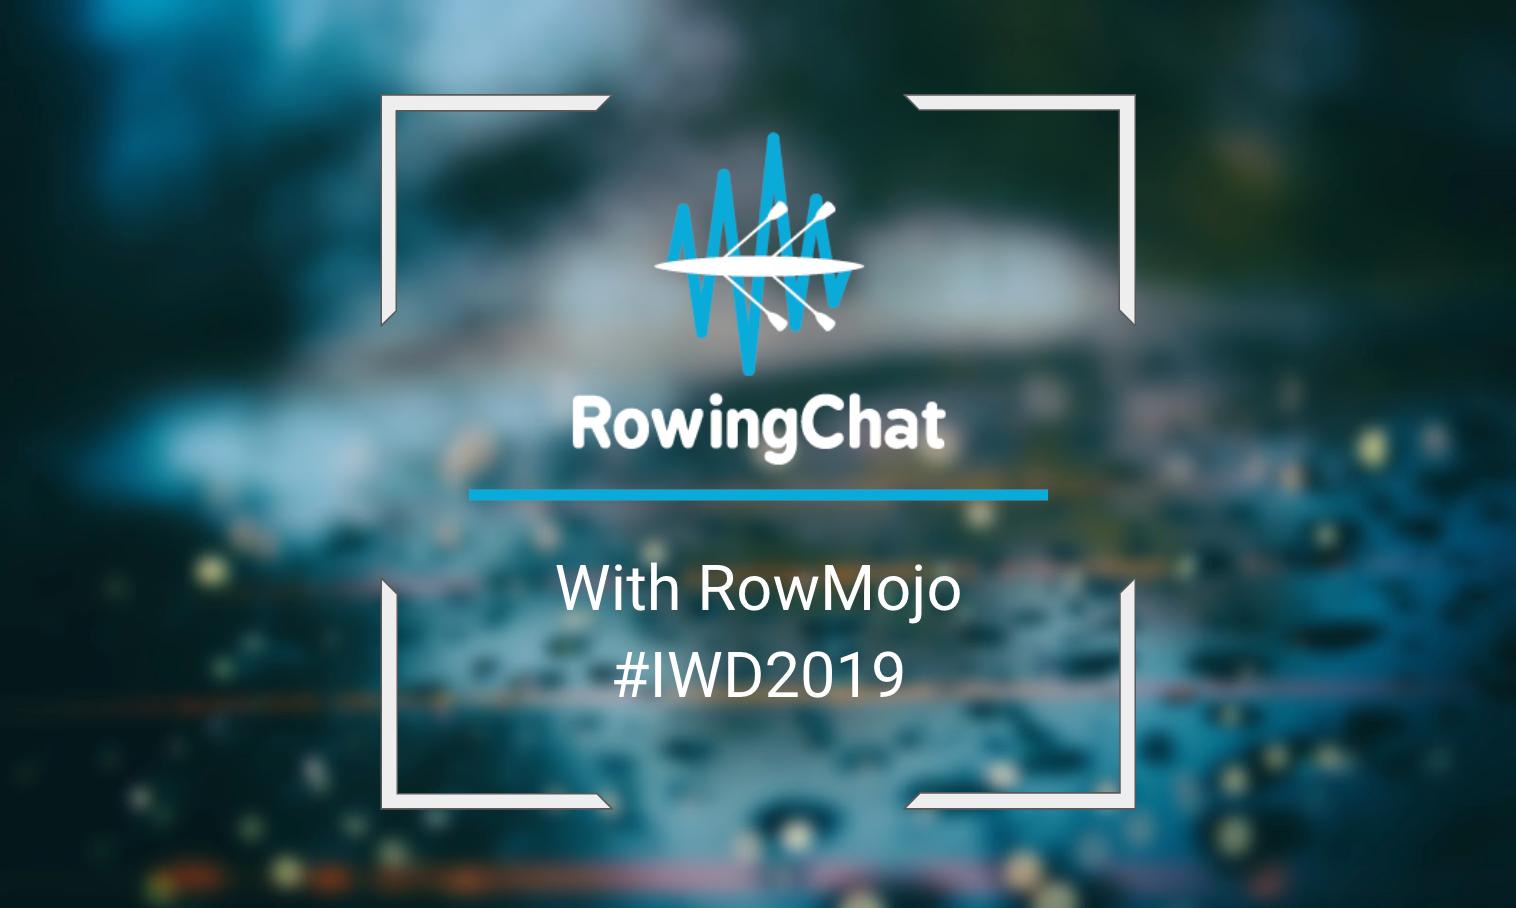 Rowmojo, Paul Reynolds, likeagirl, rowingchat